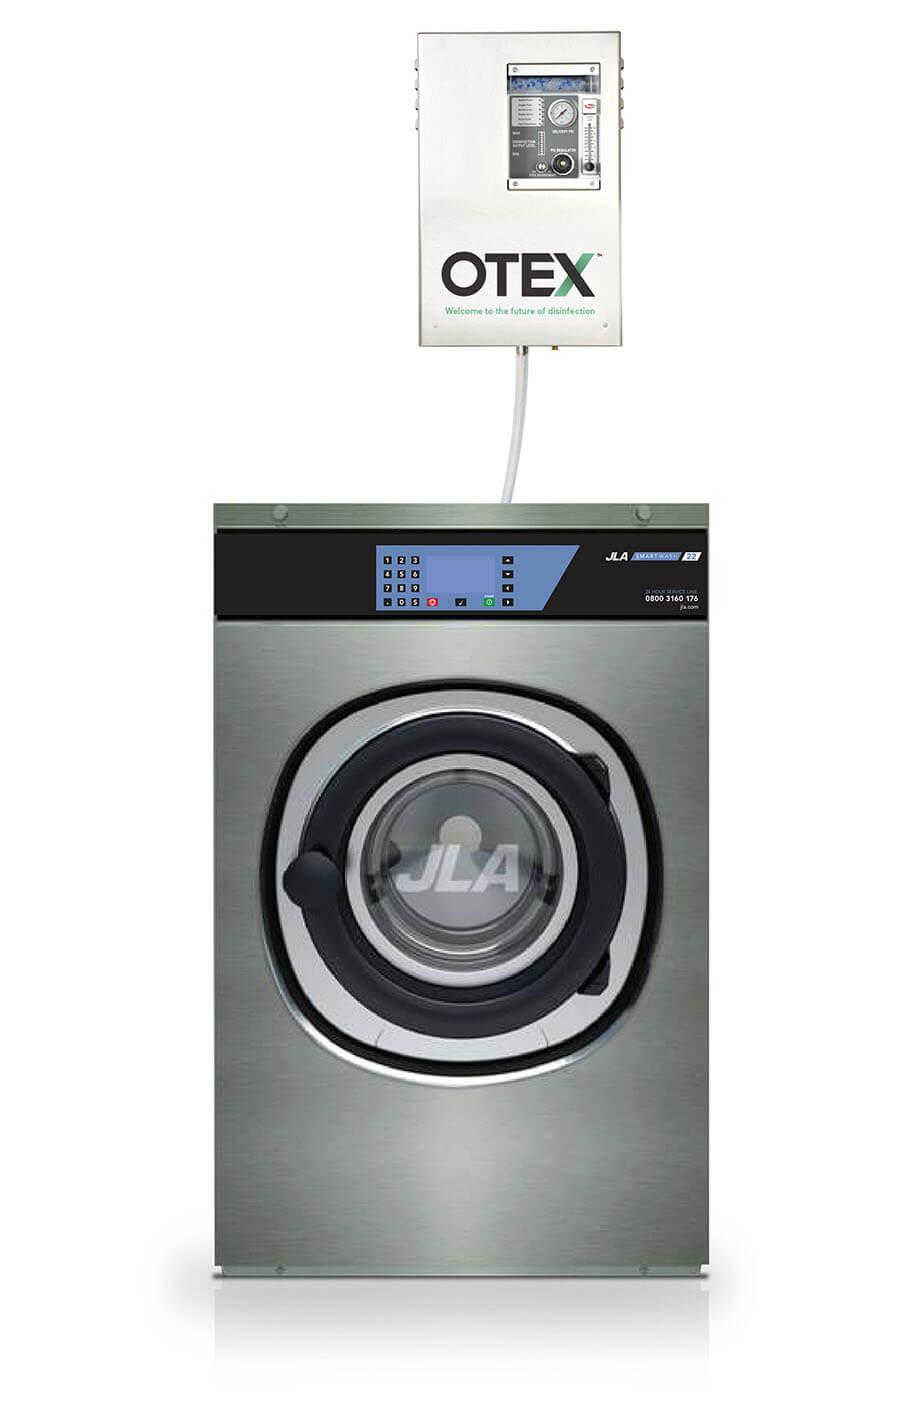 JLA OTEX Laundry